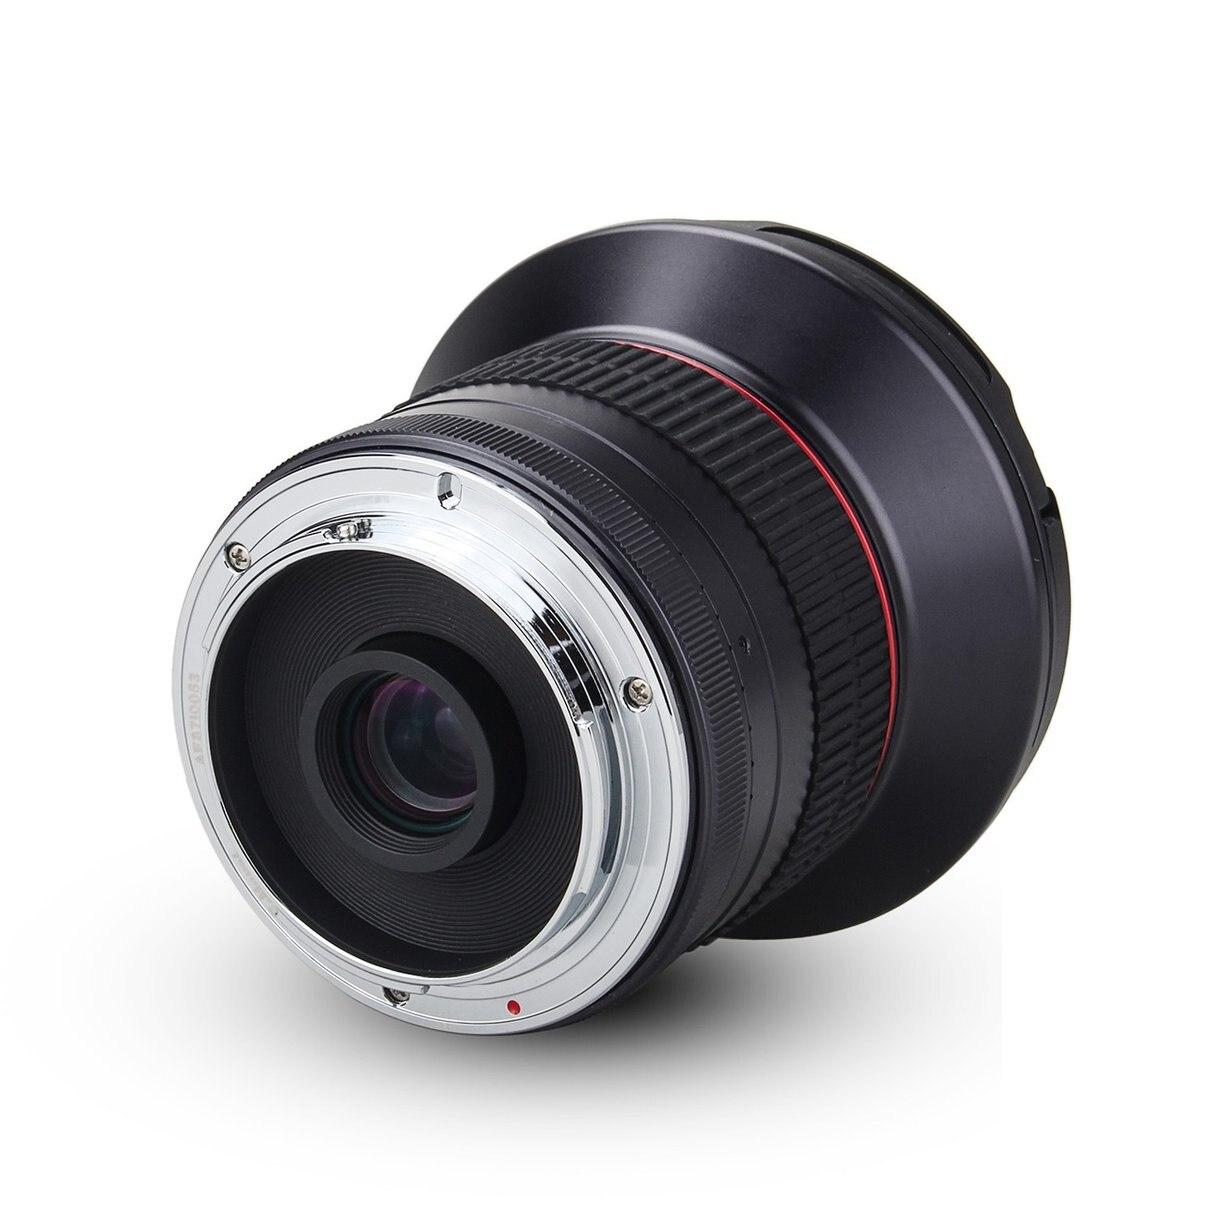 Meike 12mm f/2.8 Ultra Grand Angle Objectif Fixe avec Amovible Capot pour Sony Alpha et Nex Mirrorless E-Montage Caméra A7 A7R A7S II